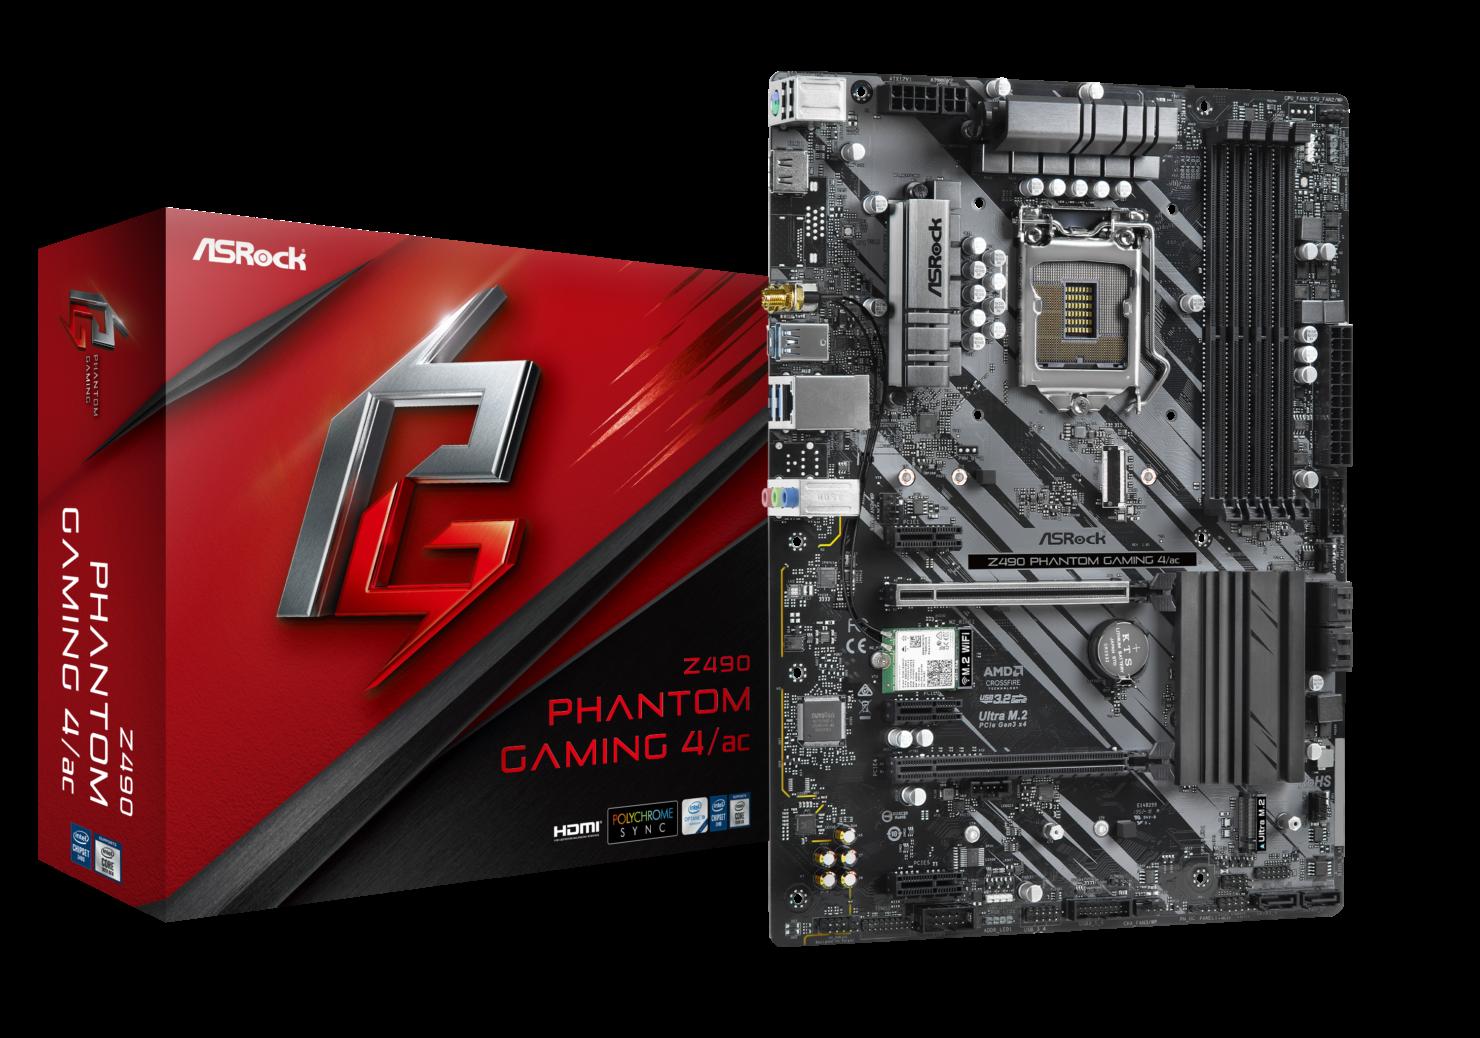 asrock-z490-phantom-gaming-4-ac